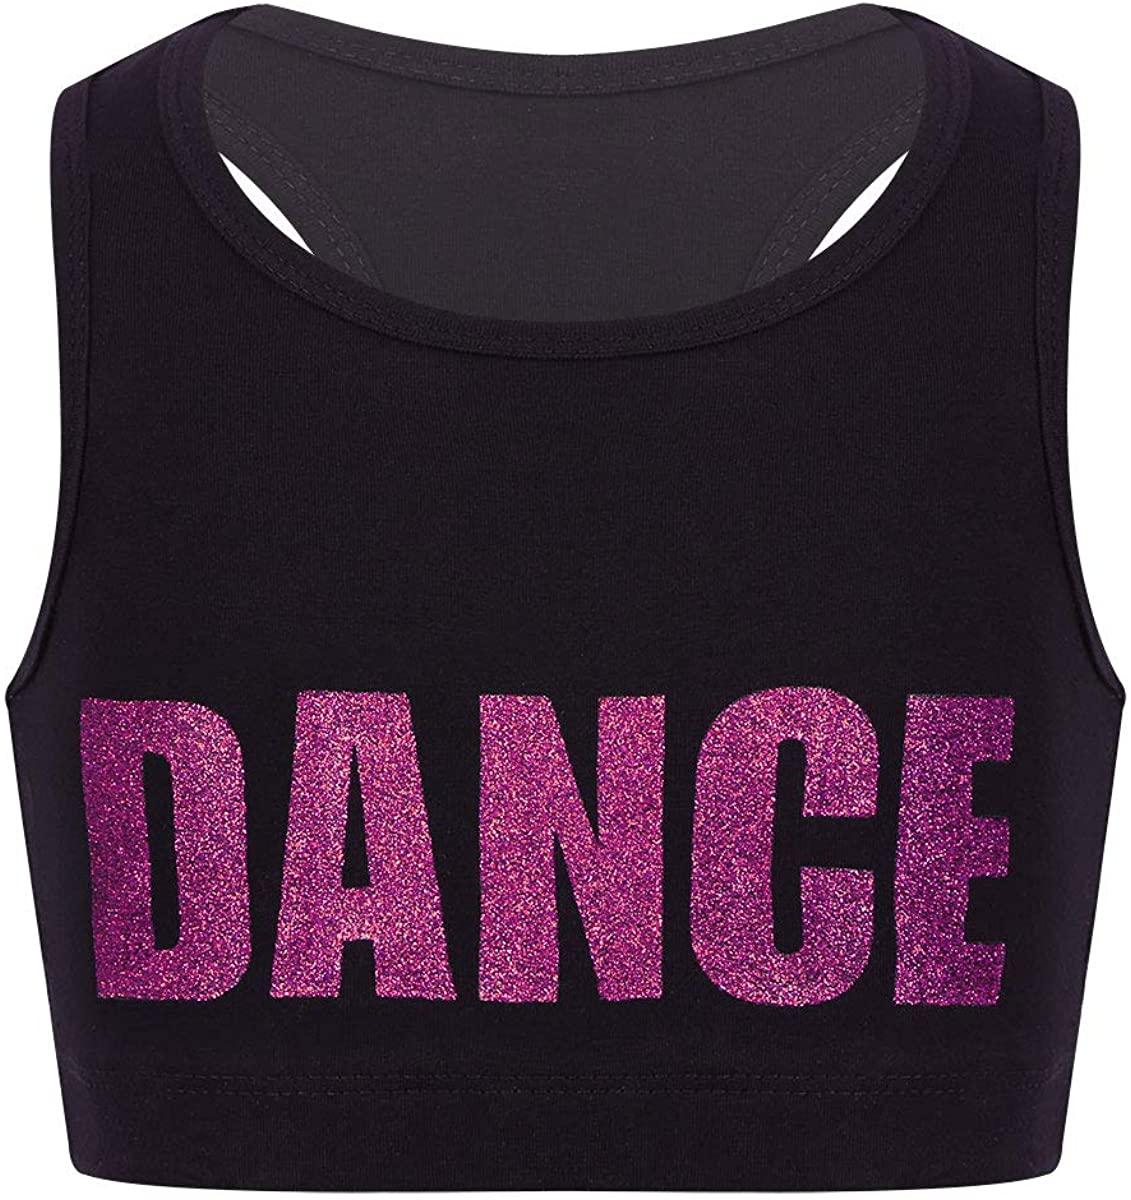 ranrann Kids Girls Racer Back Crop Bra Top Shiny Dance Printed Sports Bra Gymnastic Workout Yoga Top Outfit